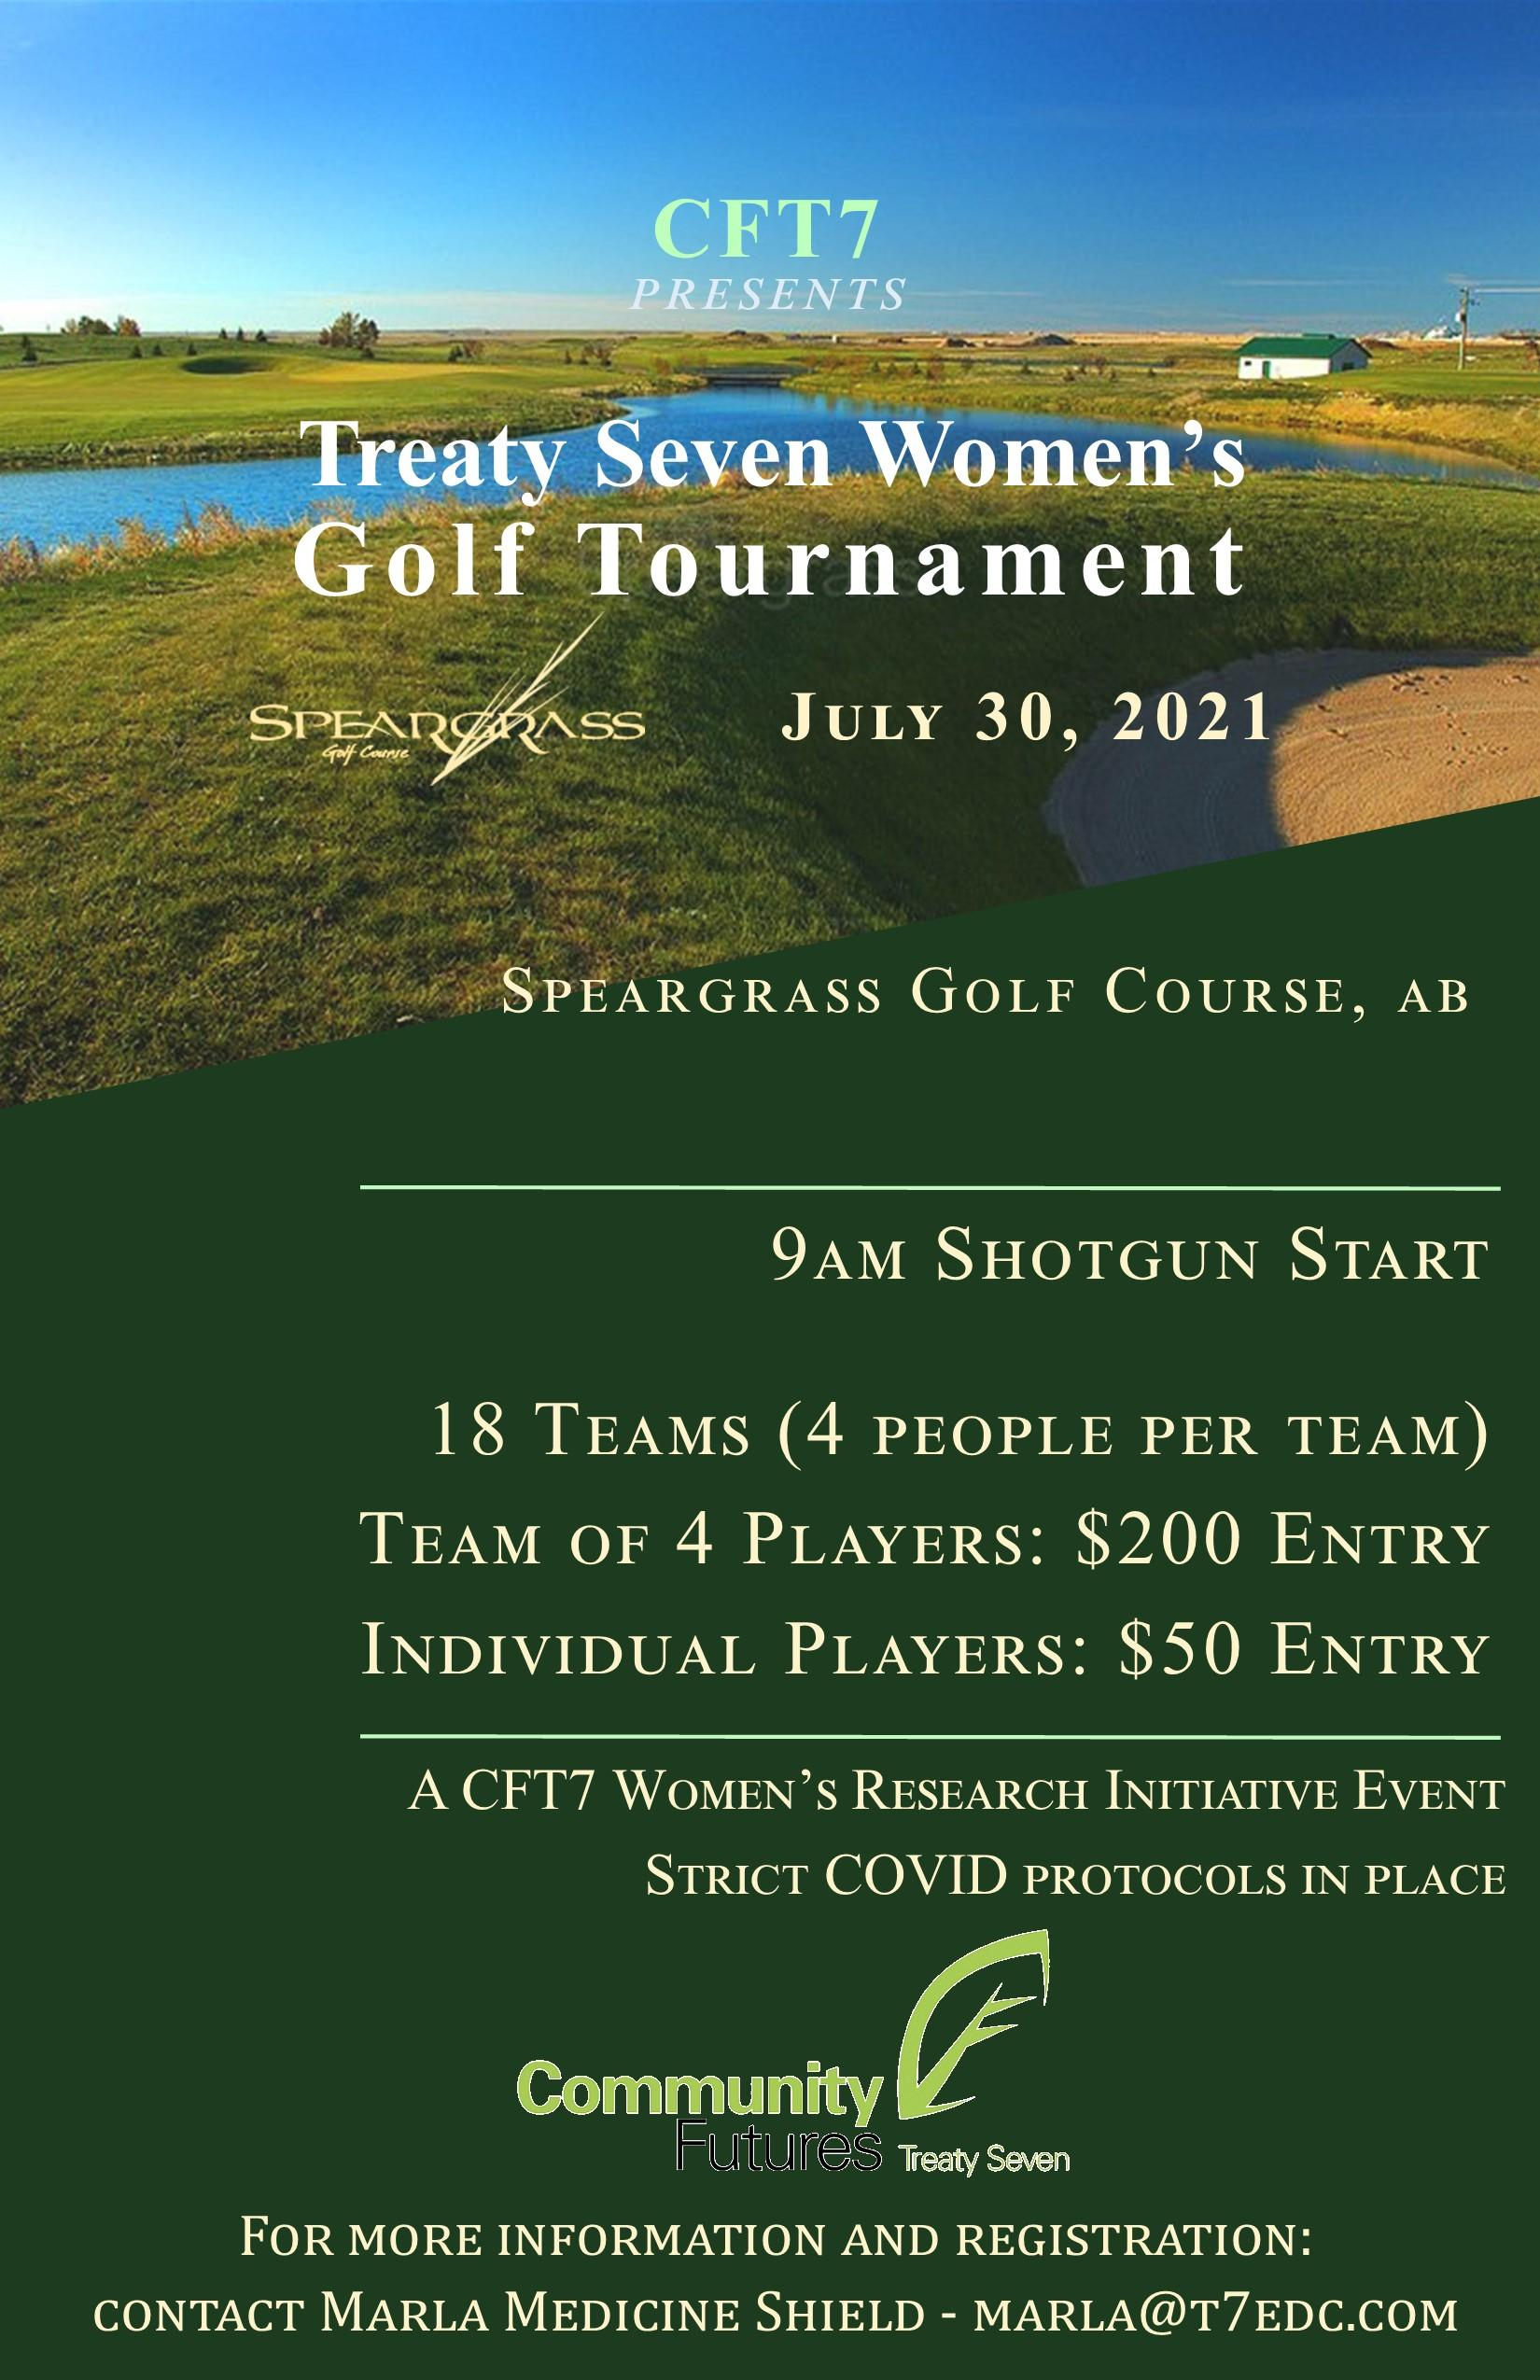 CFT7 - Treaty 7 Women's Golf Tournament